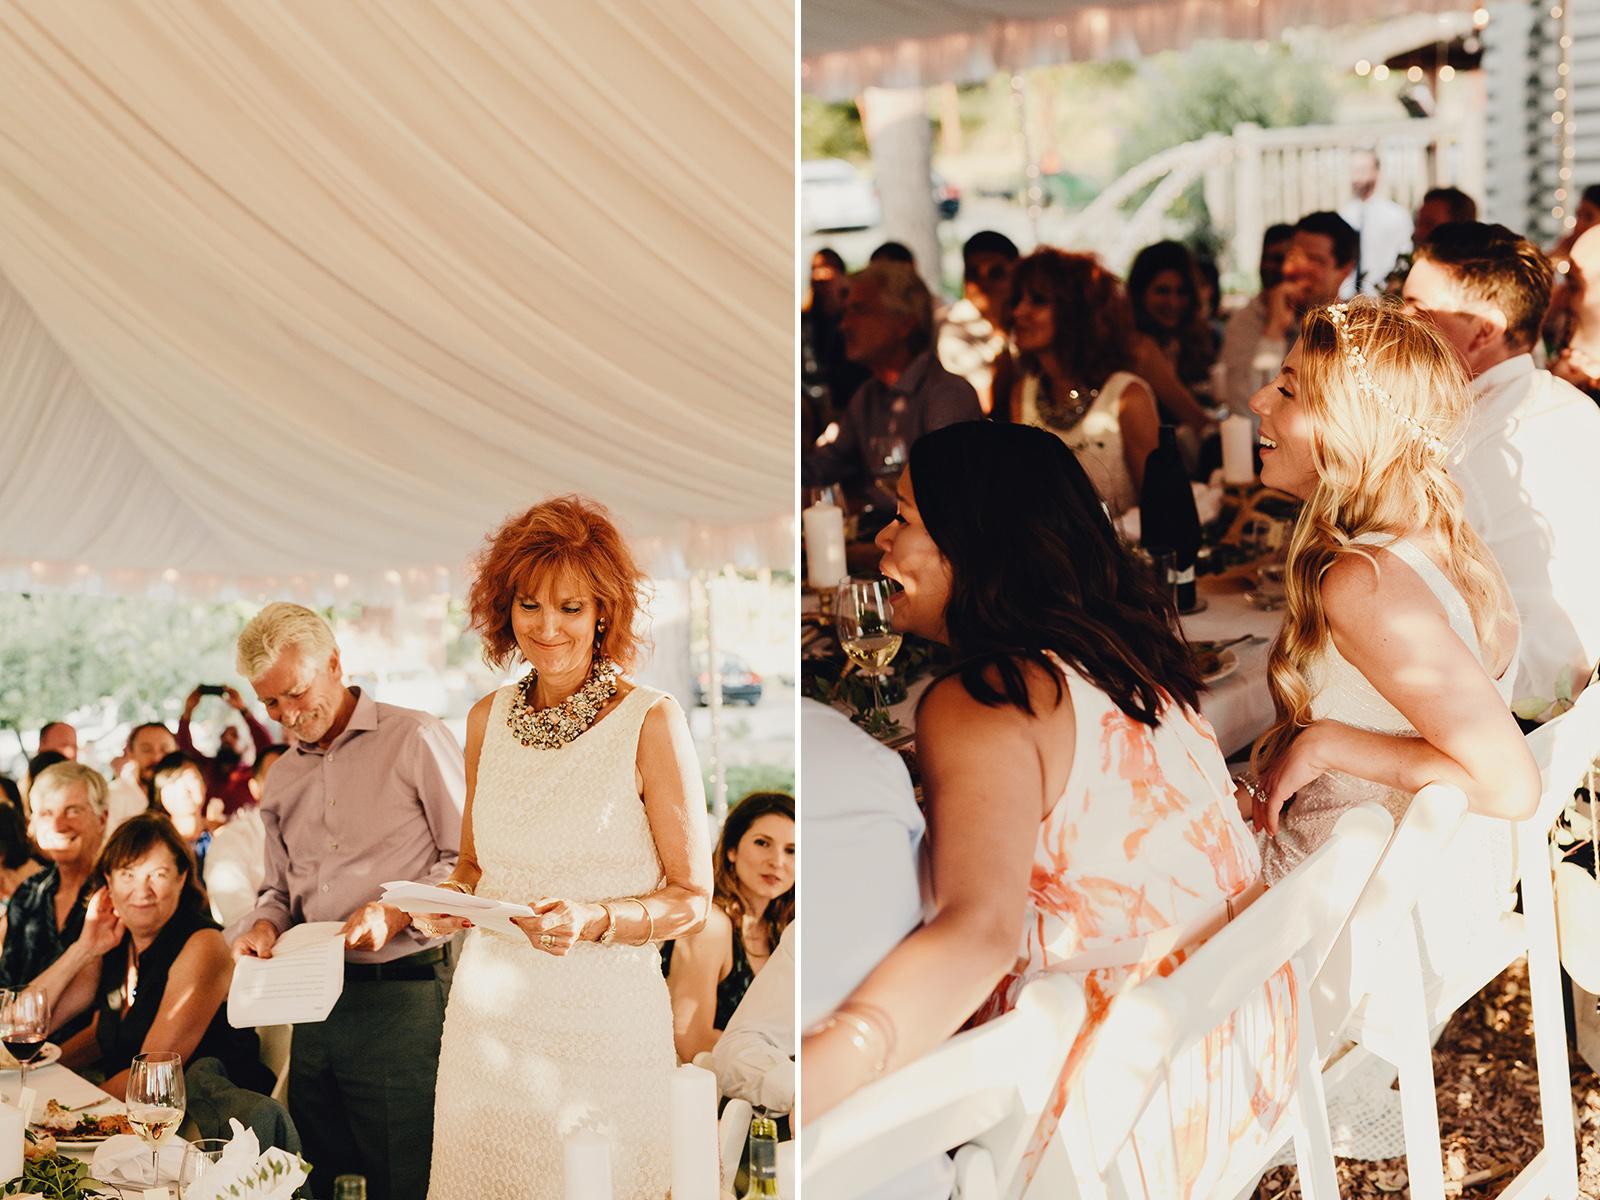 speeches-at-wedding.jpg